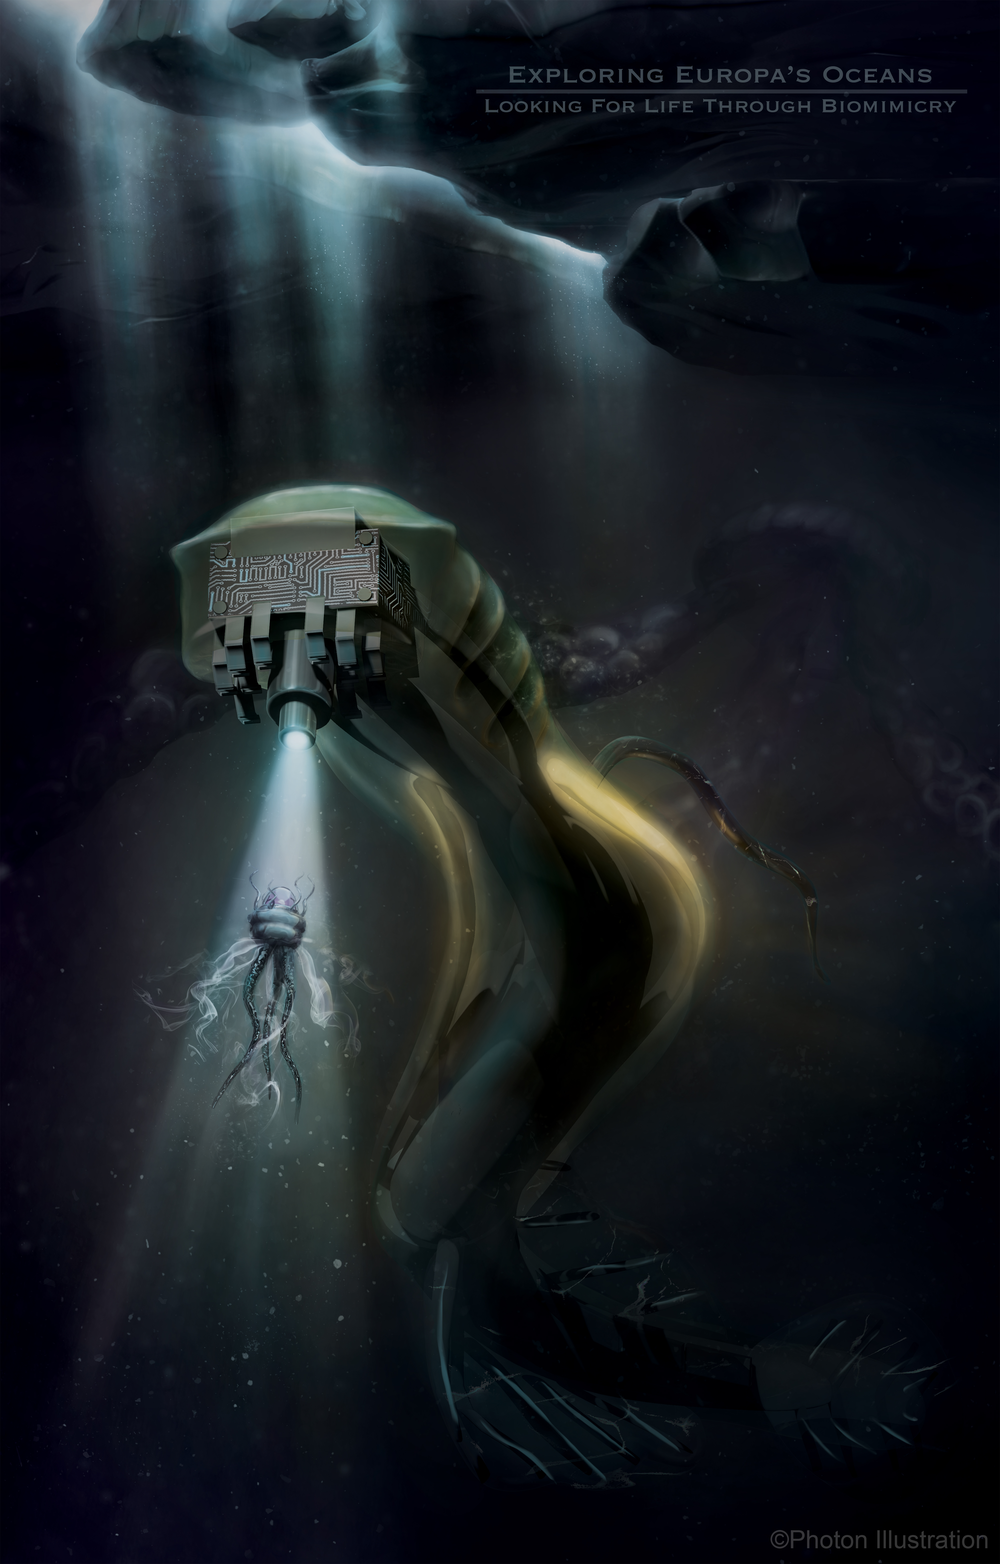 Exploration of Europa